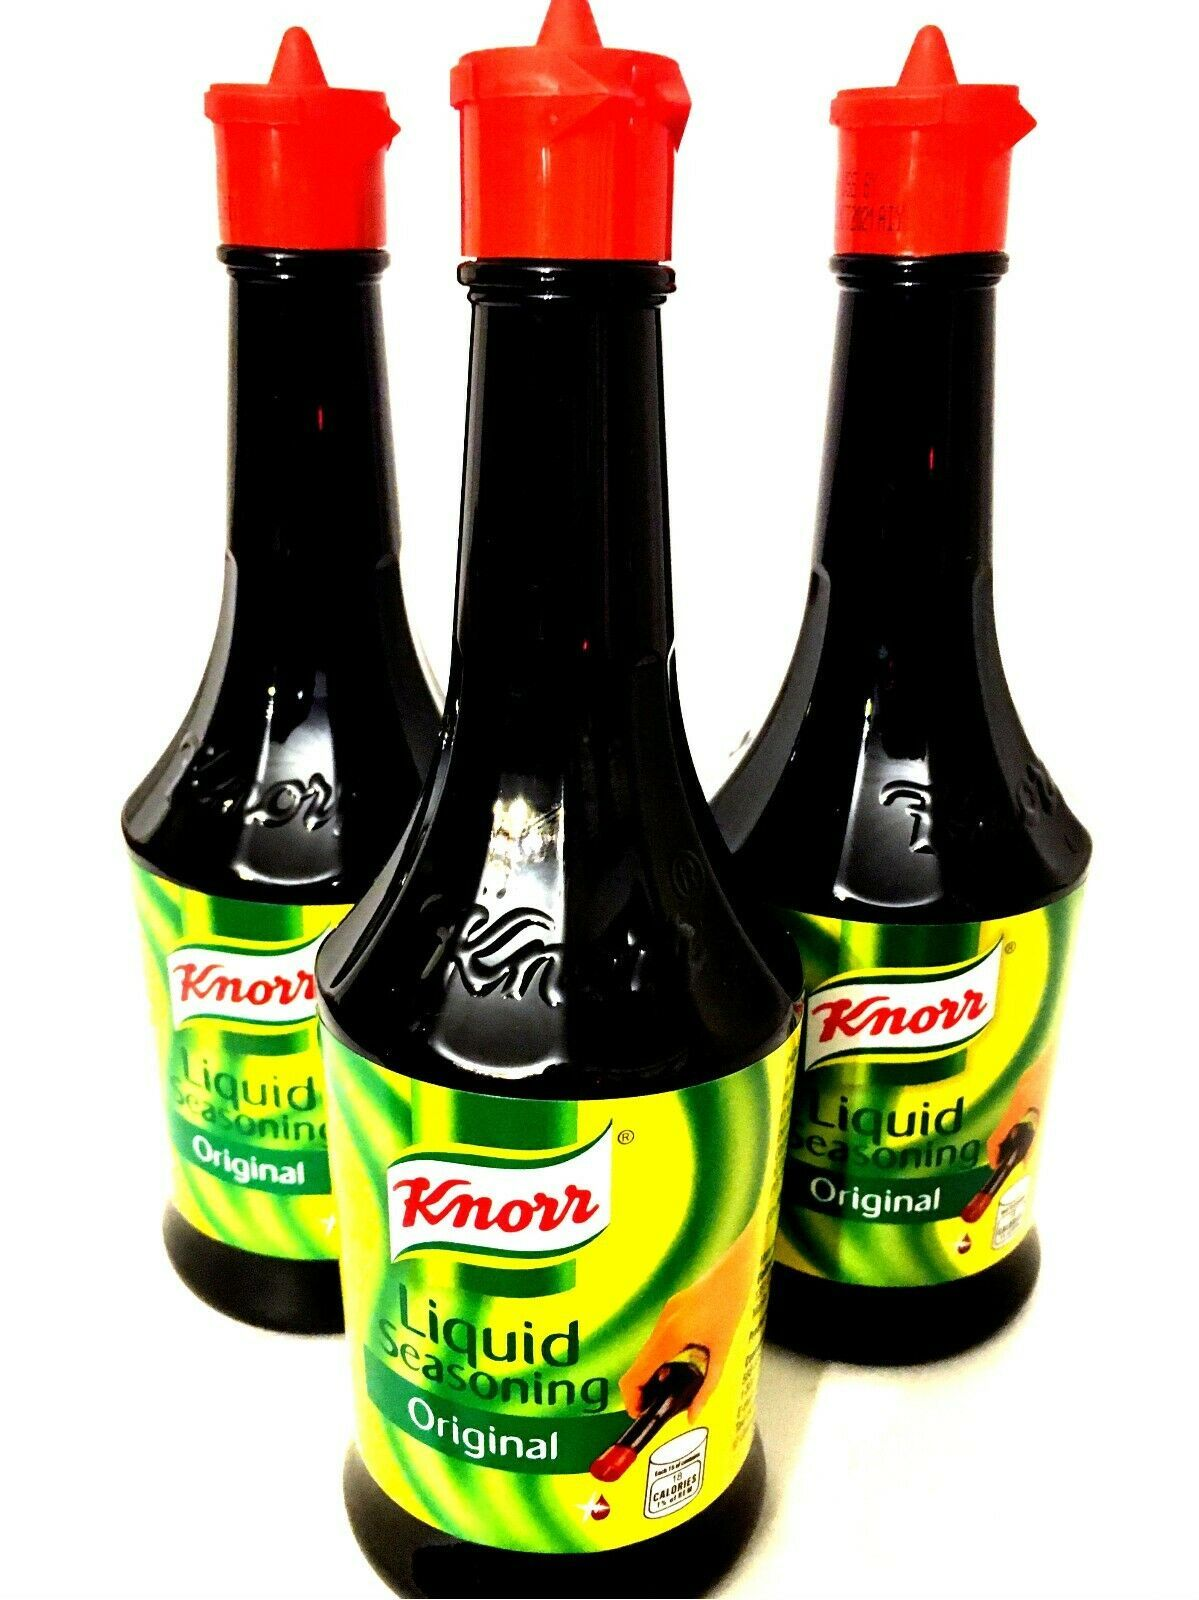 Knorr Liquid Seasoning Original 250 ML ( Pack of 3 ) ~ FREE 2-3 DAYS SHIPPING - $16.82